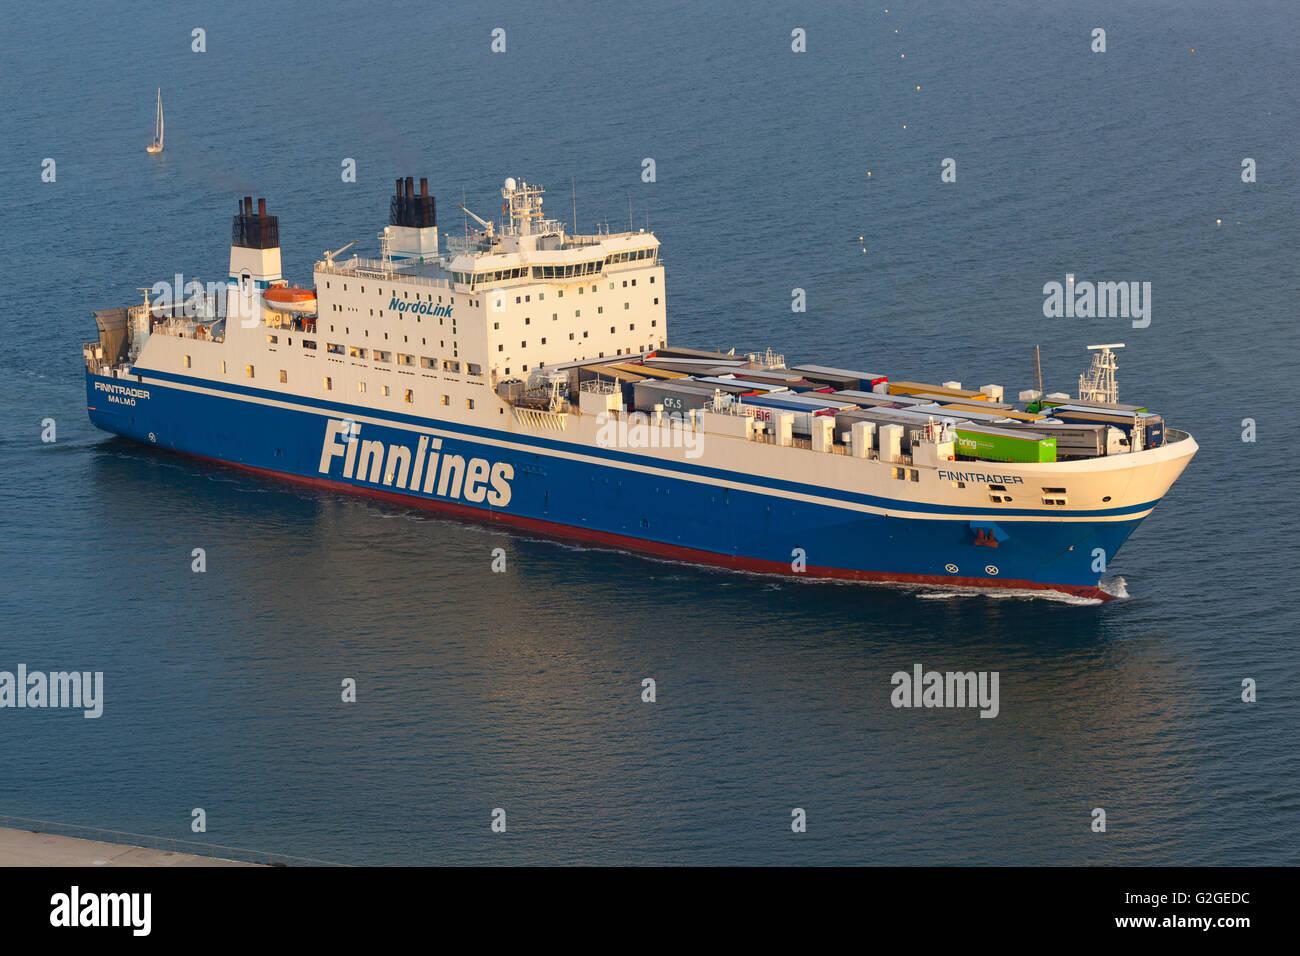 Finnlines 'Finntrader' arriving at the Port of Travemünde, Germany. - Stock Image